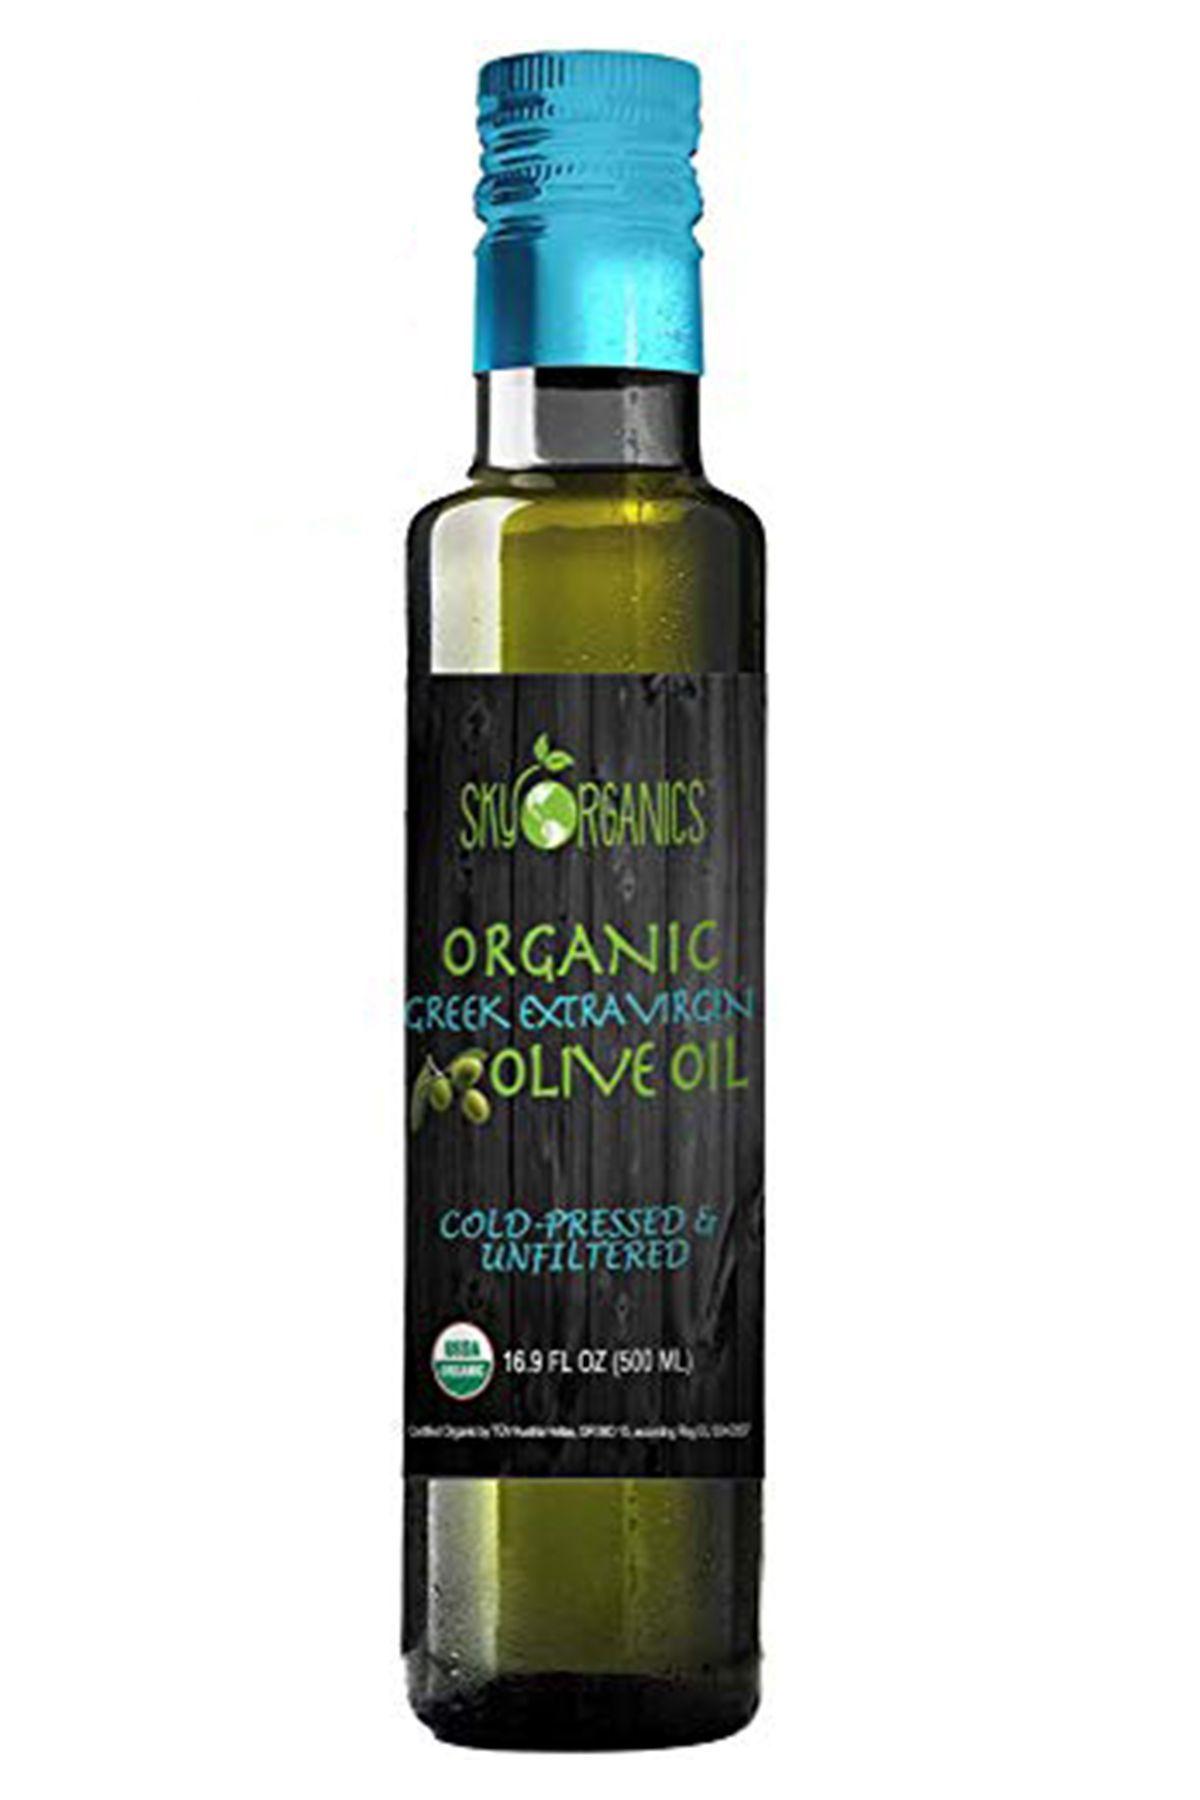 Sky Organics Organic Extra Virgin Olive Oil